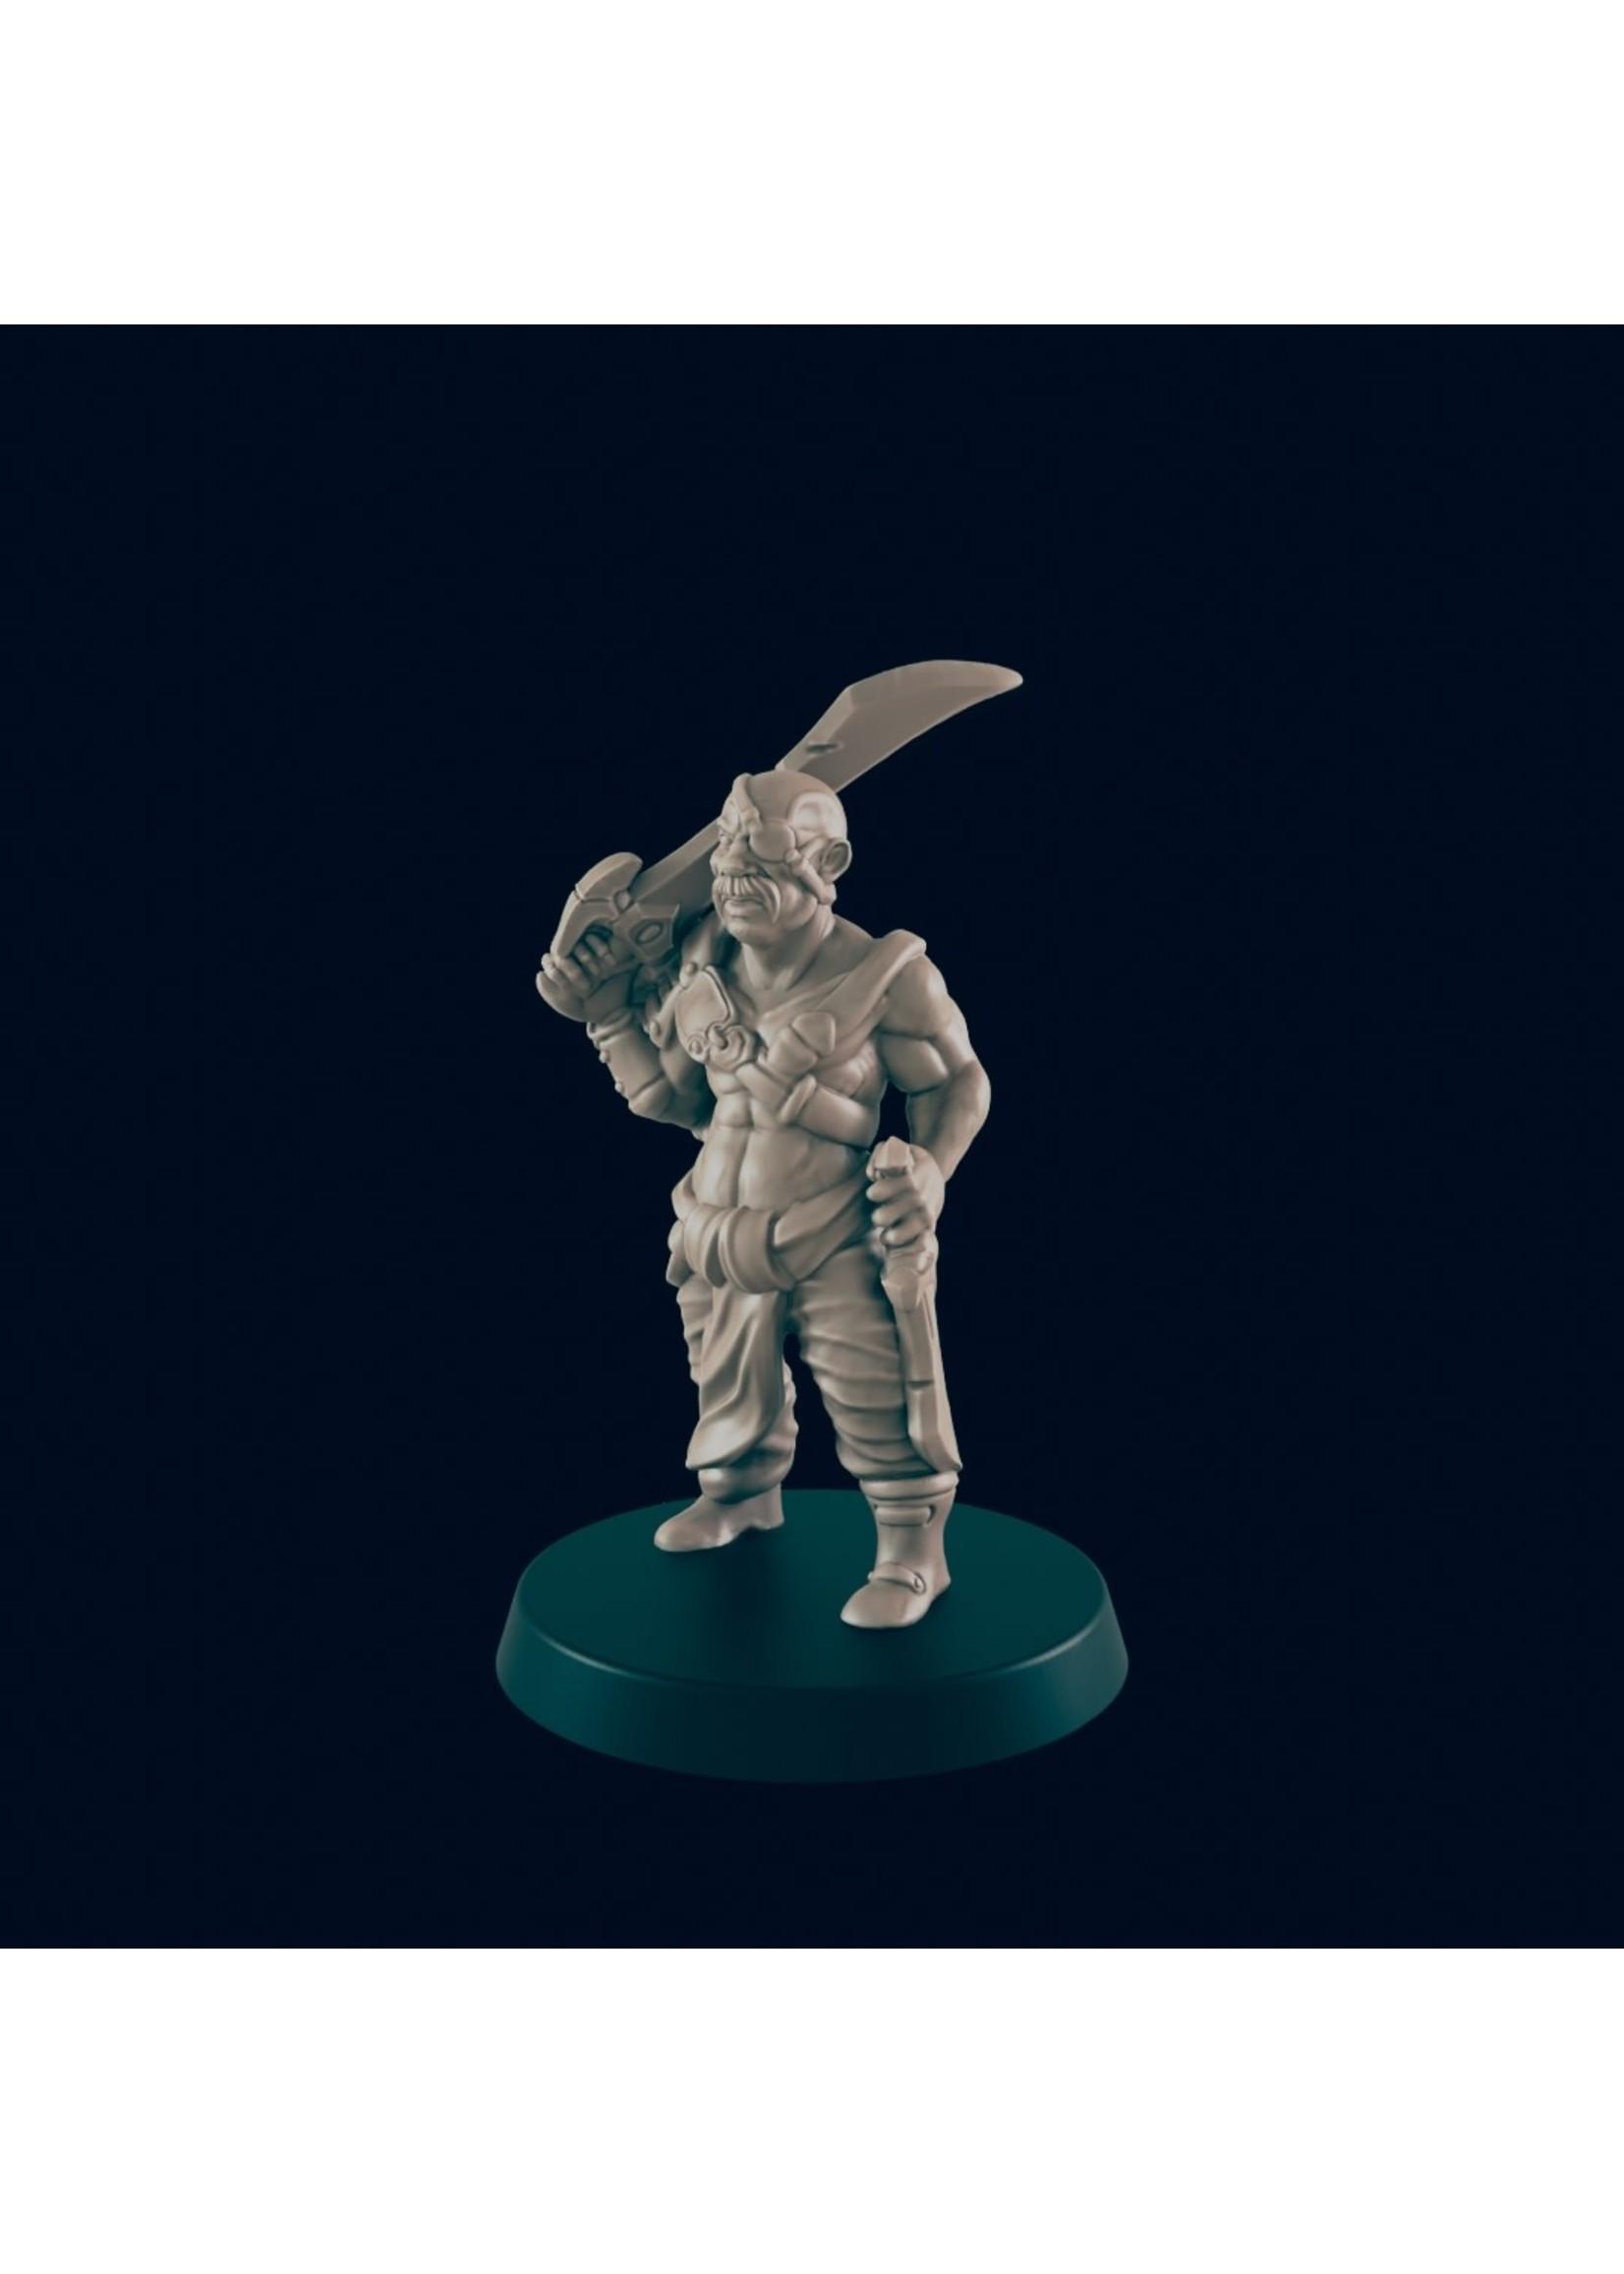 3D Printed Miniature - Human Bandit - Dungeons & Dragons - Beasts and Baddies KS